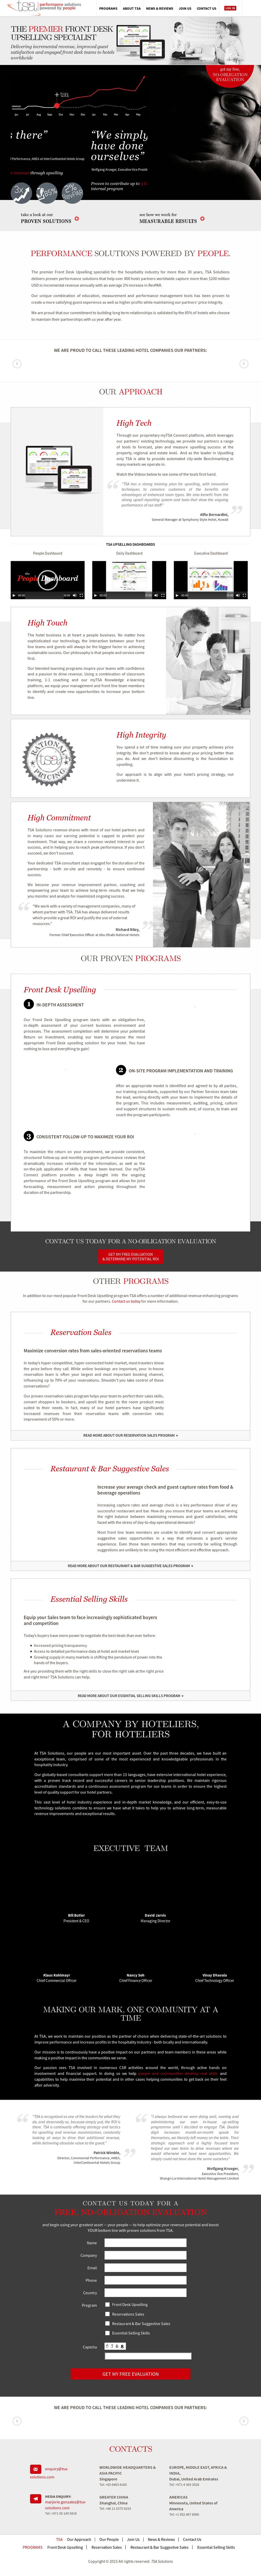 Owler Reports - TSA Solutions: TSA Partners with Copthorne